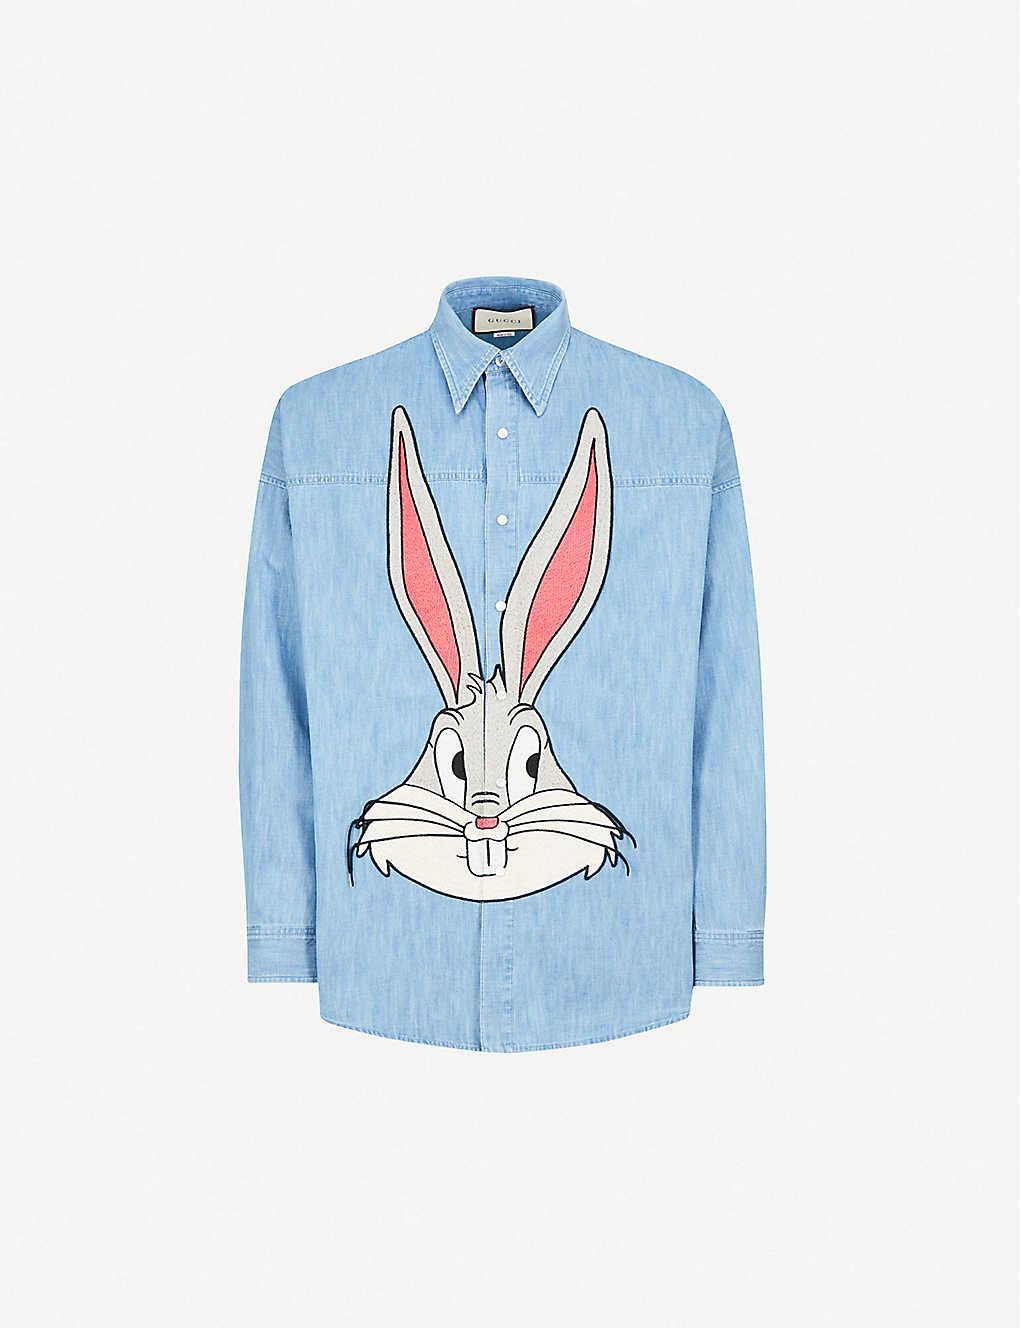 45ff6a0c515 GUCCI - Bugs Bunny regular-fit denim shirt